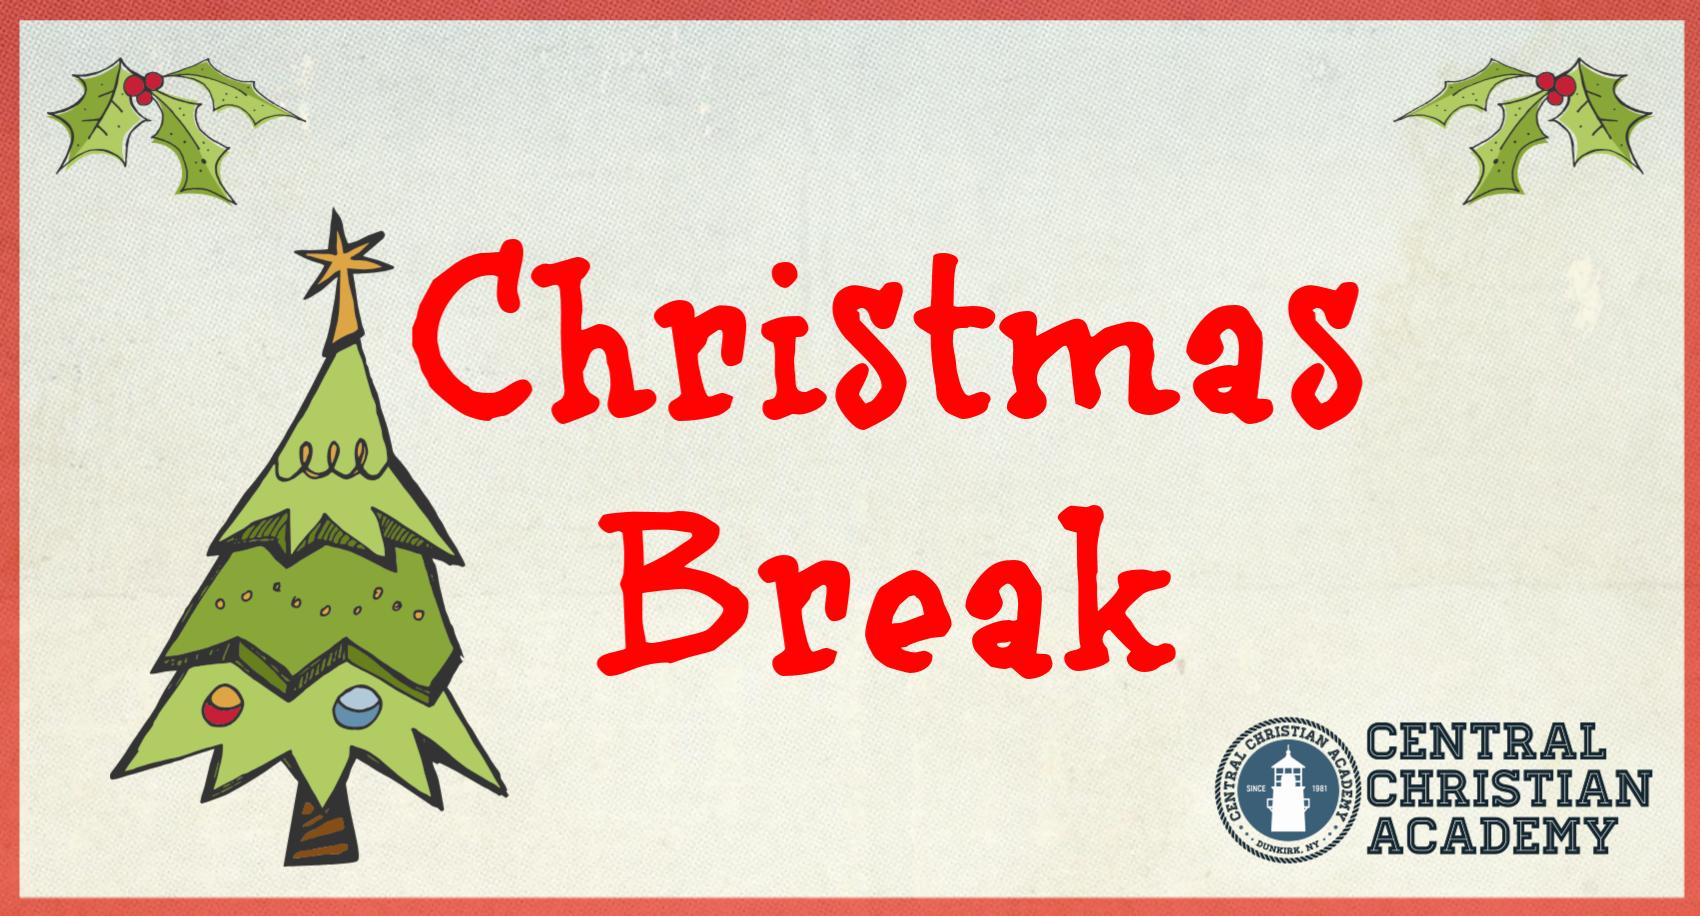 No School - Christmas Break - Central Christian Academy